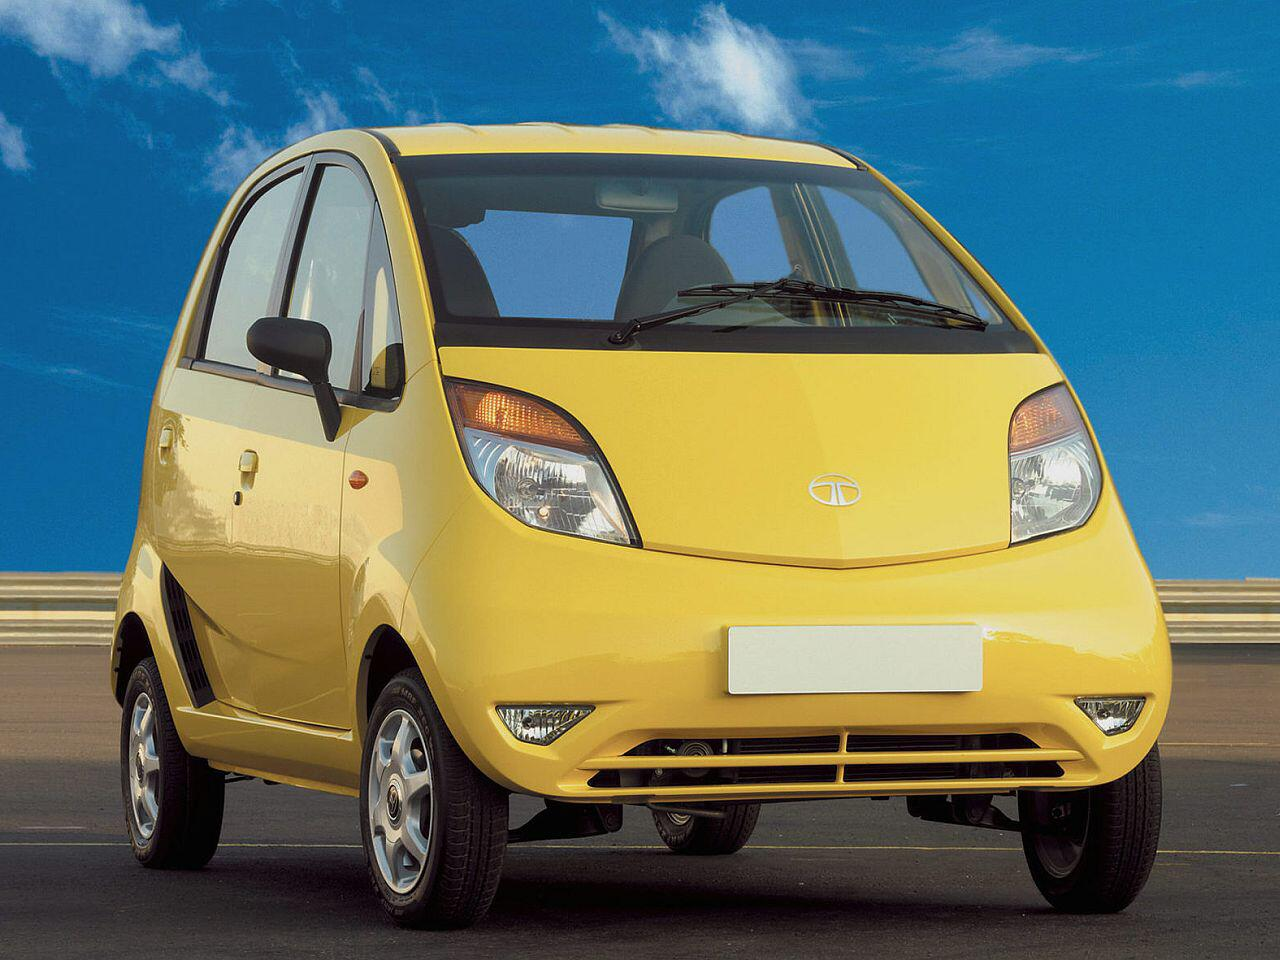 Bild zu Billig-Auto Tata Nano: Da kann selbst ein Dacia nicht mithalten